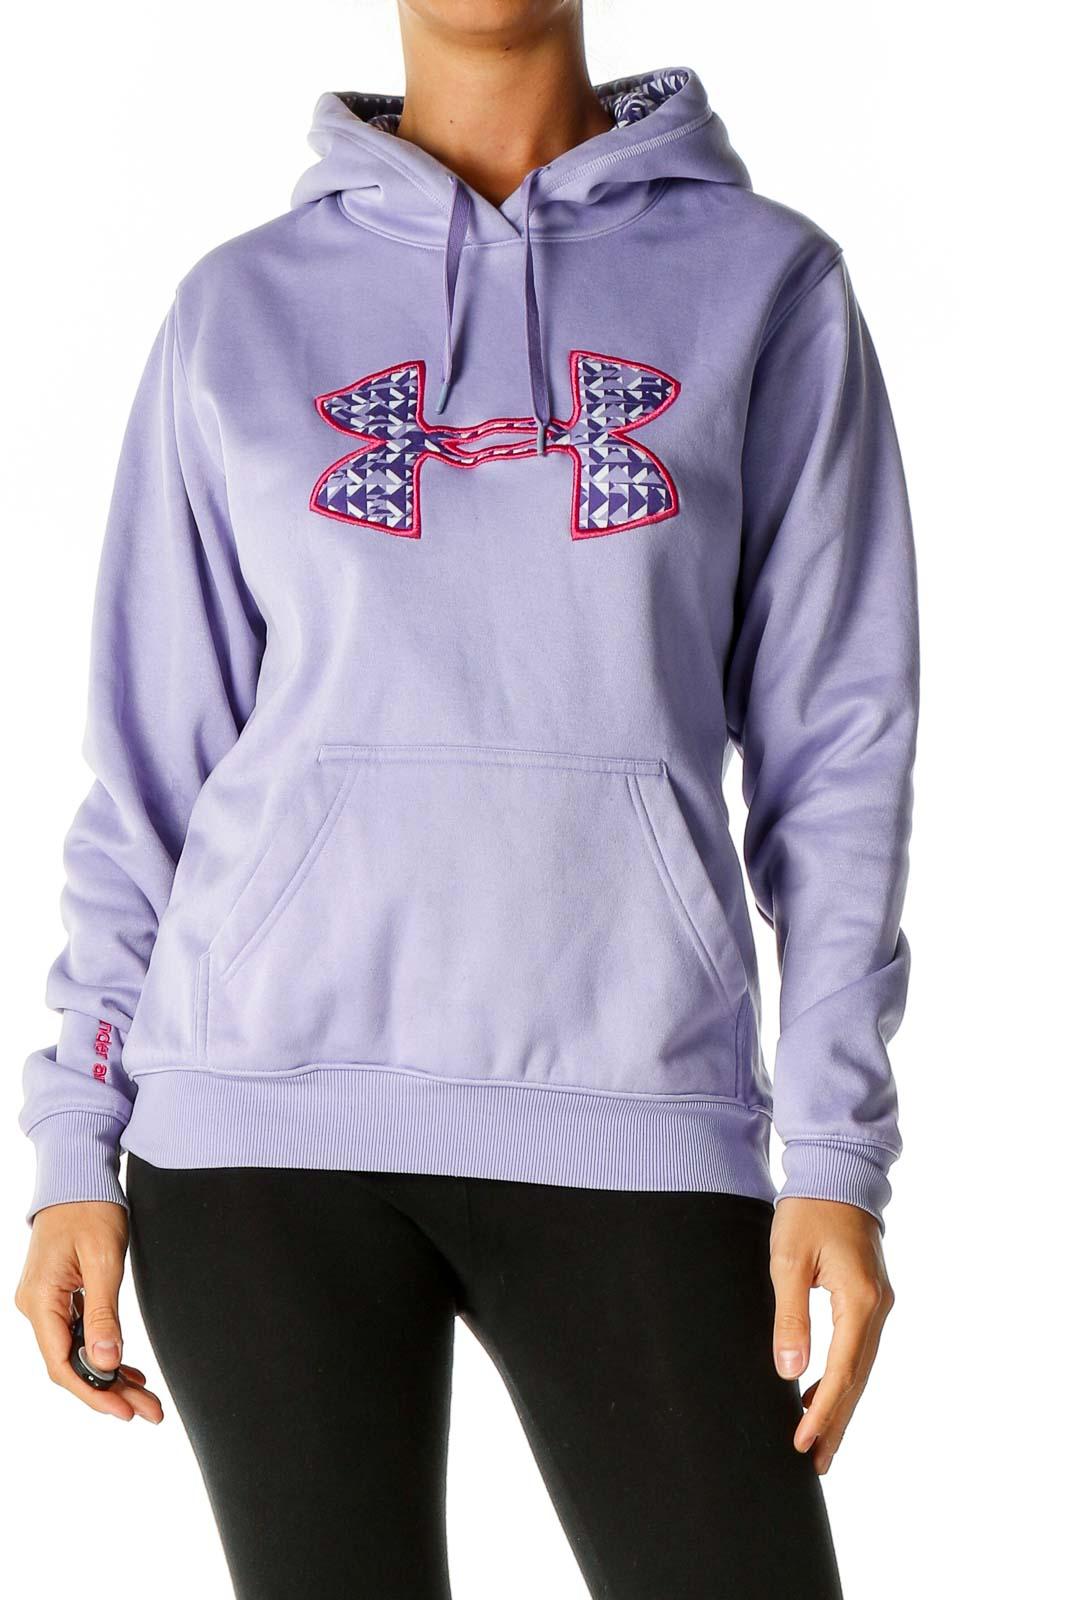 Purple Graphic Print Sweatshirt Front